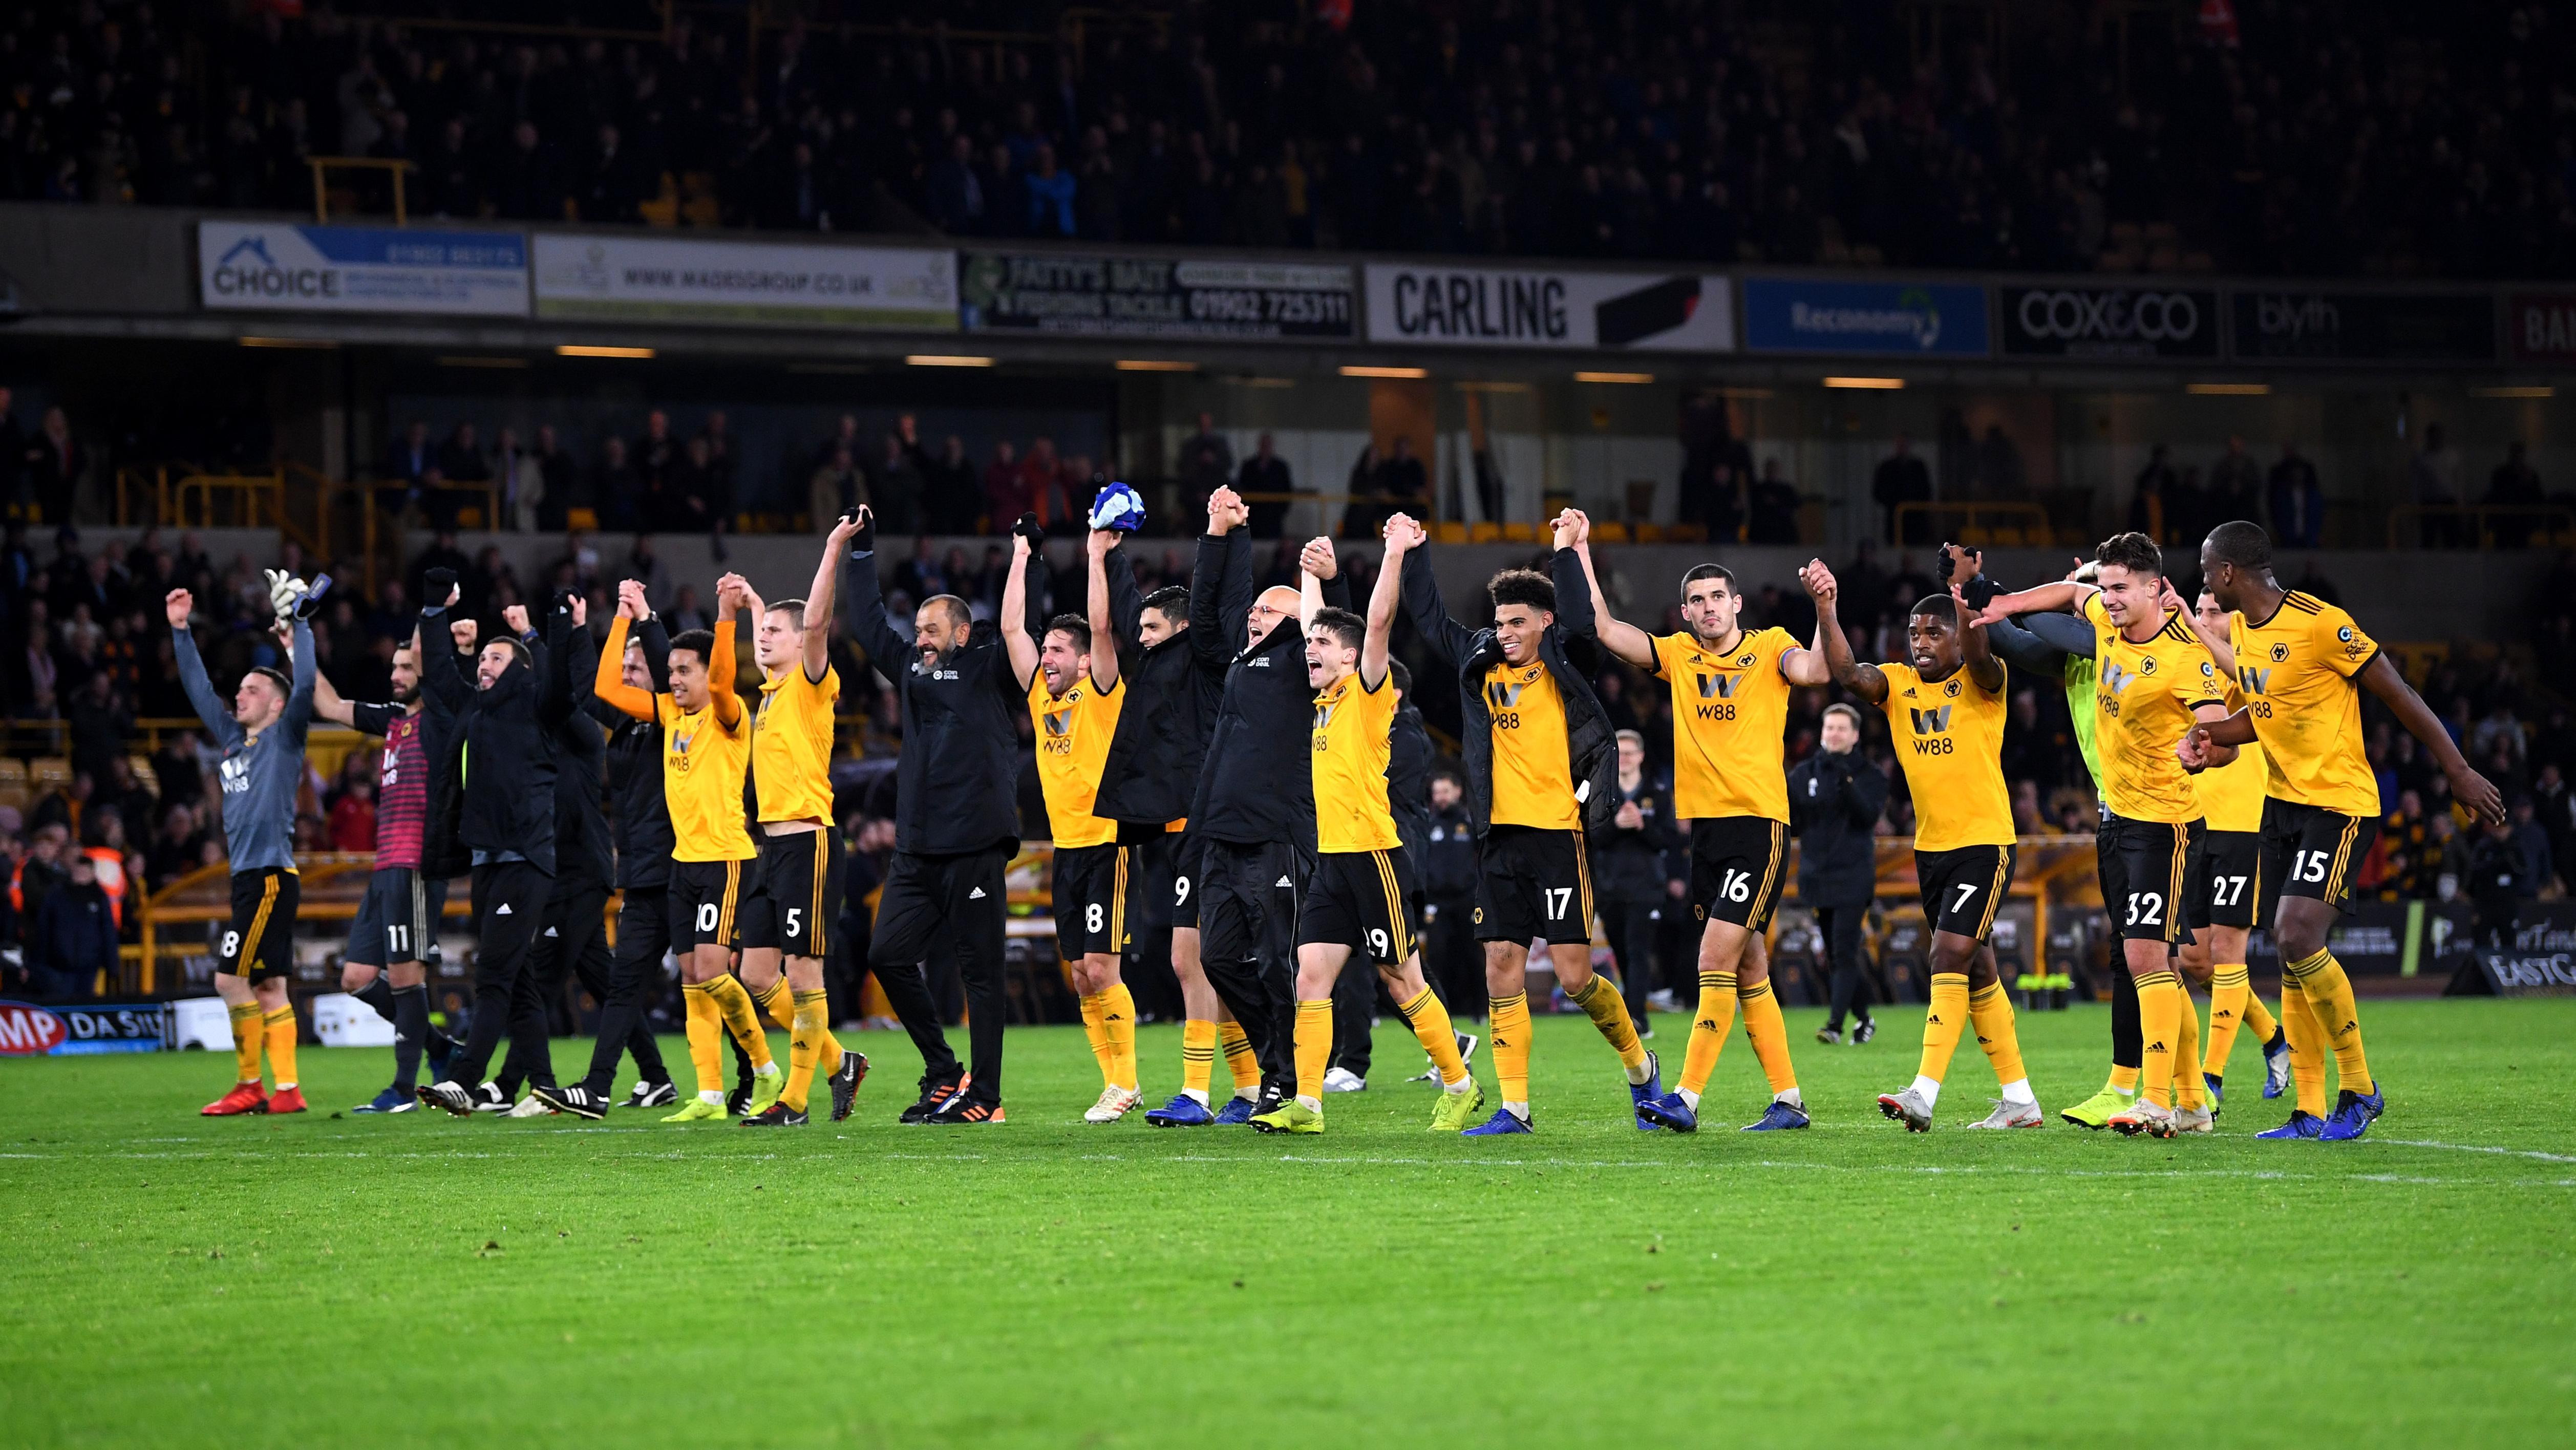 789f4bafc61f9 Wolverhampton Wanderers pomógł Wilkom Różana - Piłka nożna